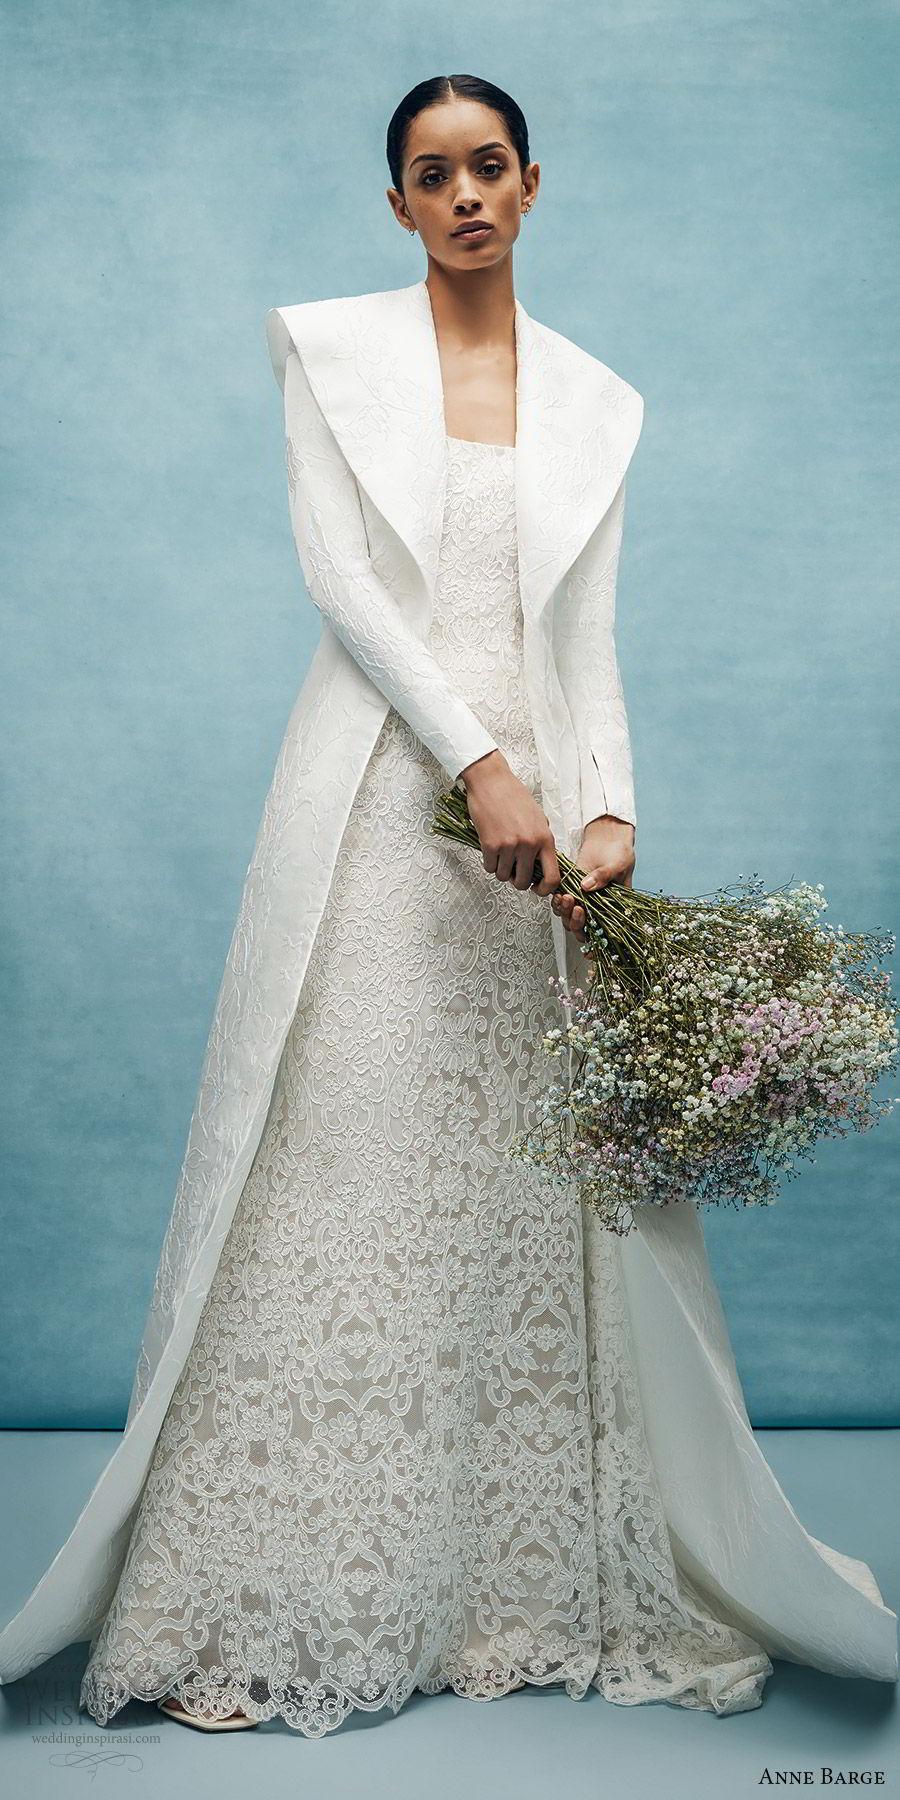 anne barge spring 2020 bridal strapless straight across fully embellished lace sheath wedding dress (3) long sleeve collar jacket elegant chapel train bv